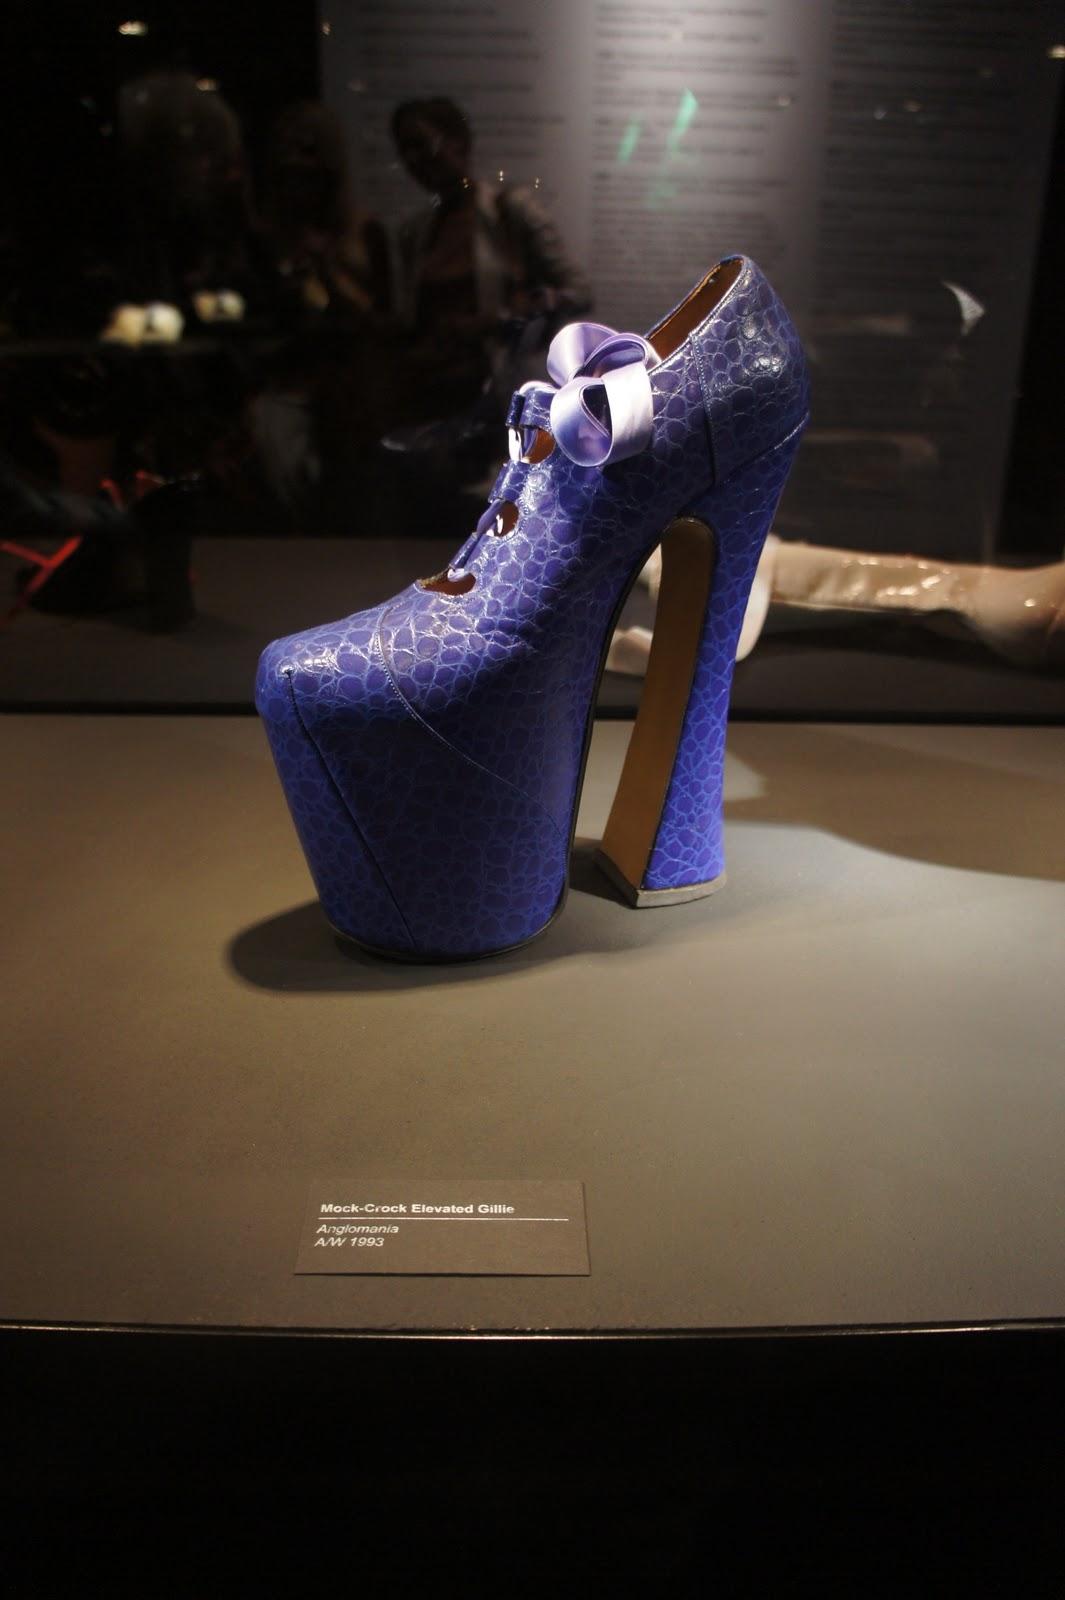 http://3.bp.blogspot.com/_4Bc8ECXYLUU/TJzIY50hN-I/AAAAAAAAAn8/1p1d4Q_N5Nw/s1600/Vivienne_westwood_exhibition_selfridges_jada_styles_naomi_campbell_fall_shoe.JPG